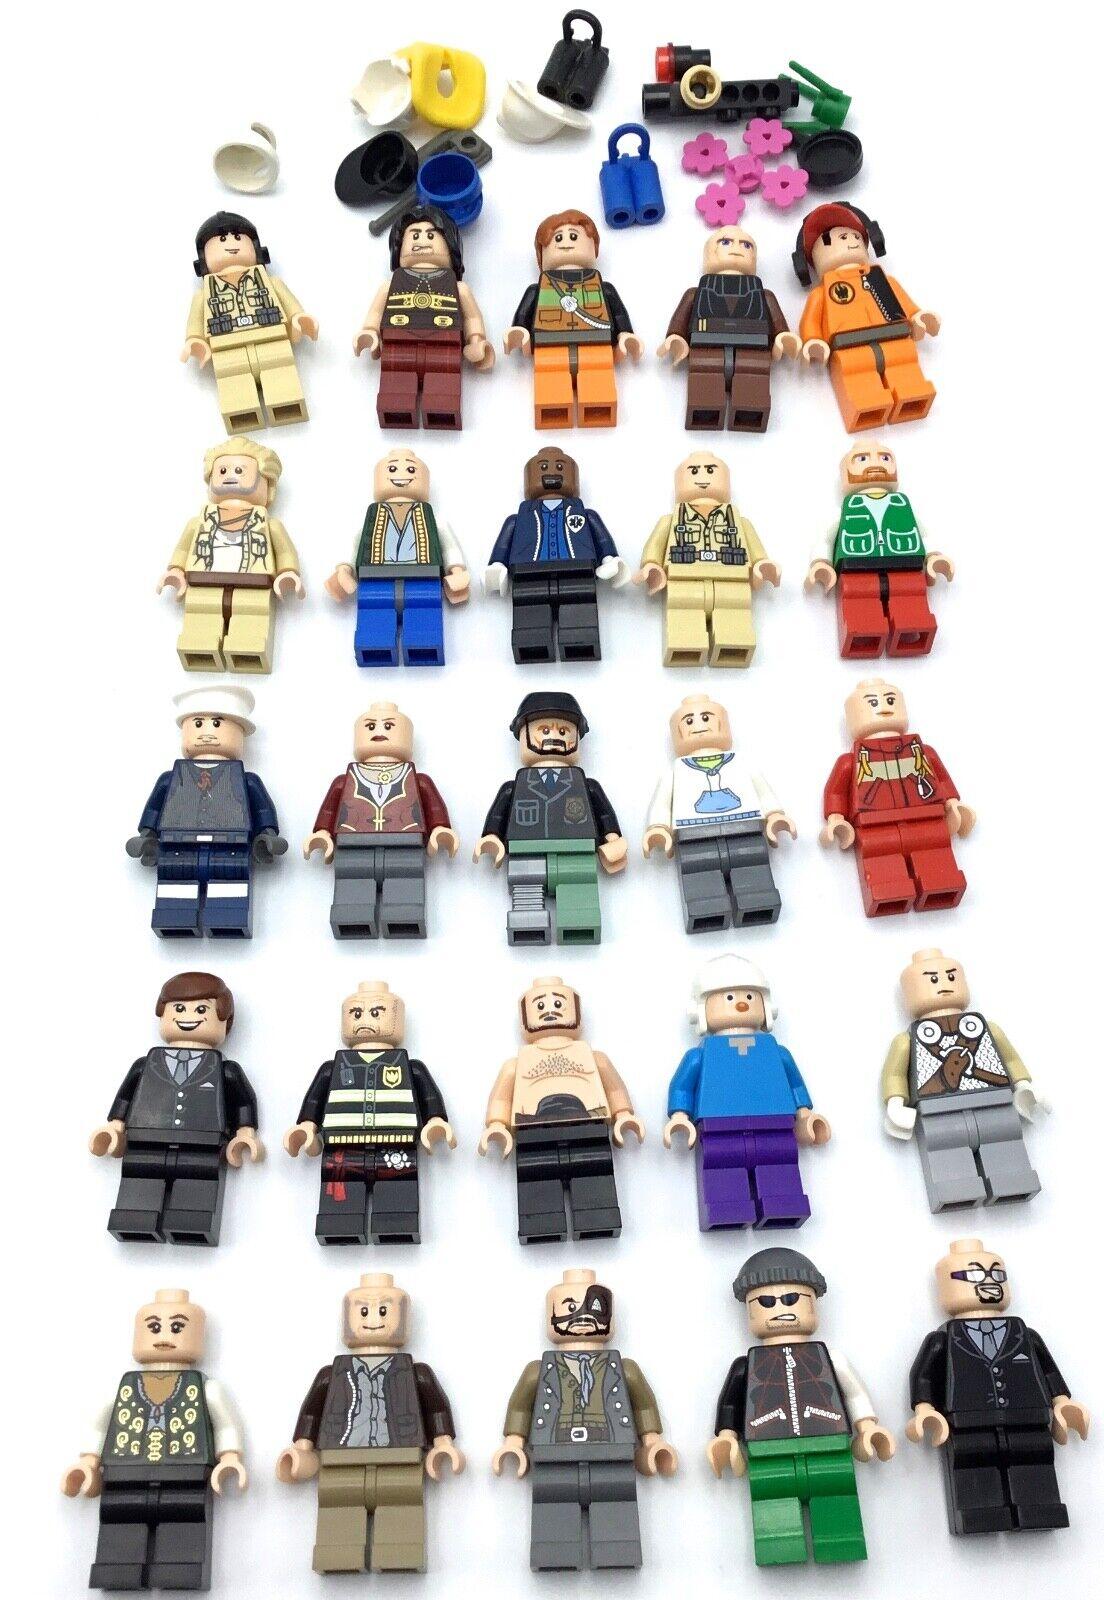 LEGO LOT OF 25 MINIFIGURES FLESH TONE PEOPLE MODERN CITY CITY CITY STAR WARS MIX 9d1181